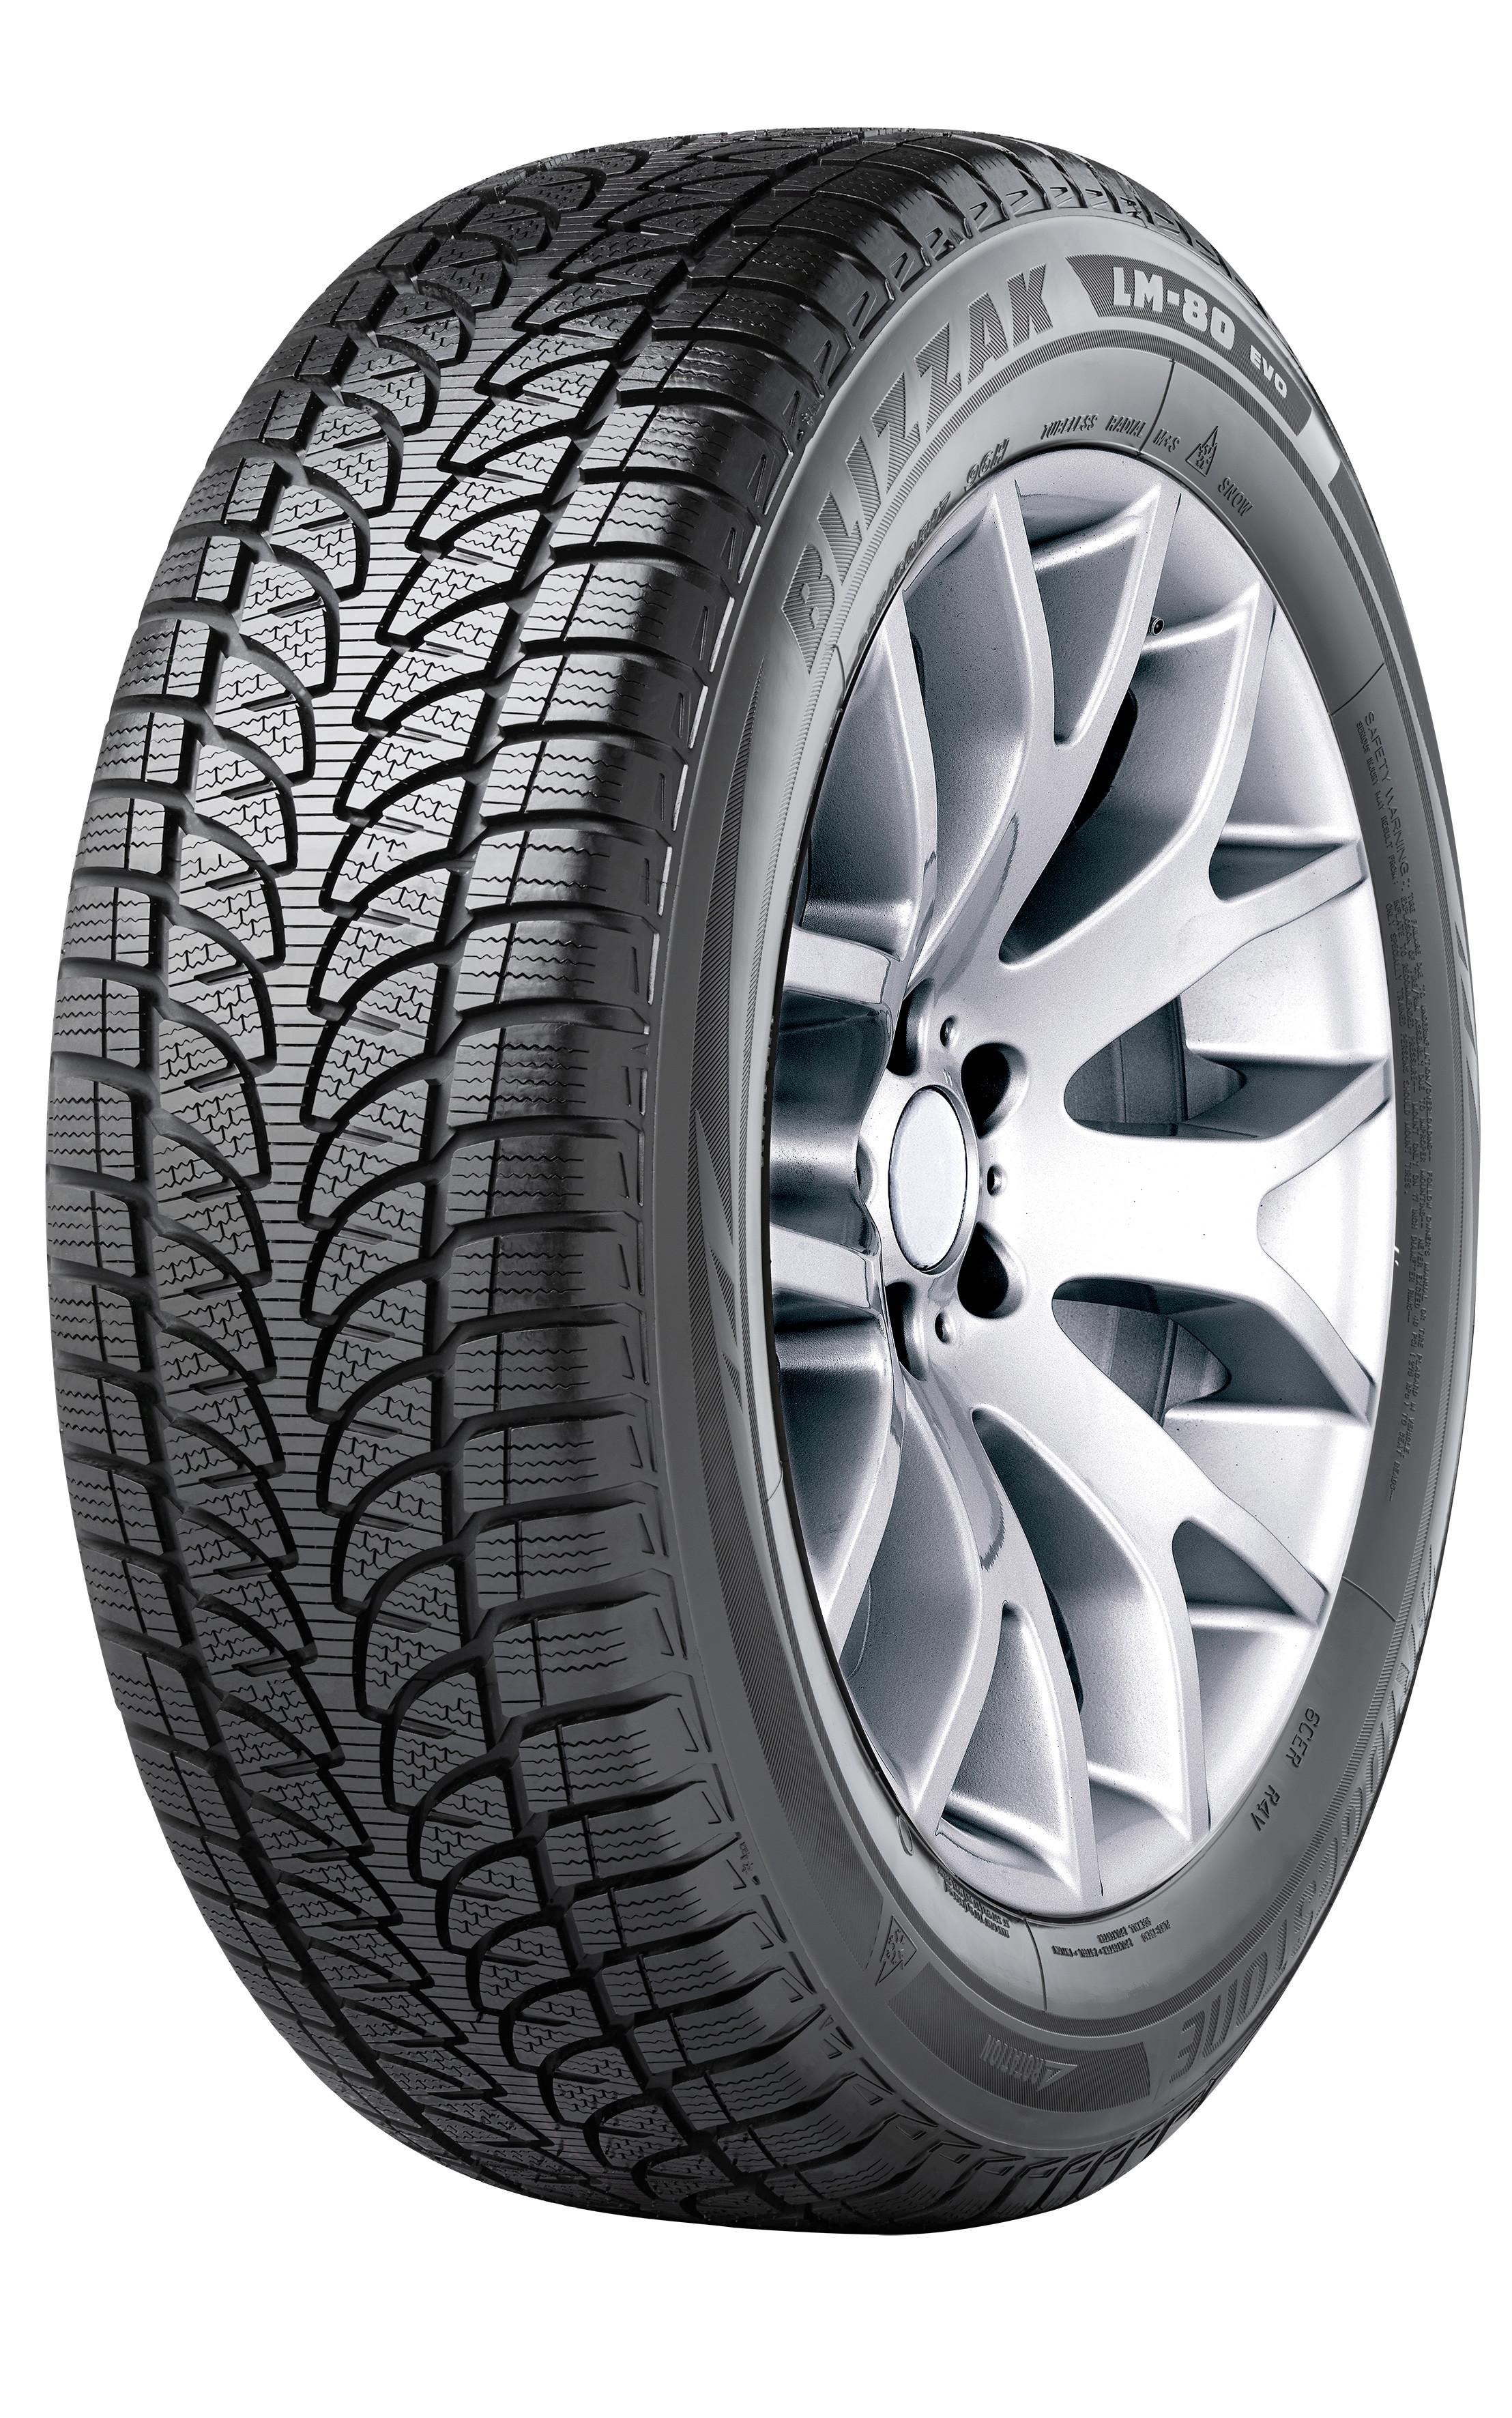 Anvelopa Iarna 245/70R16 107T Bridgestone Blizzak Lm 80 Evo